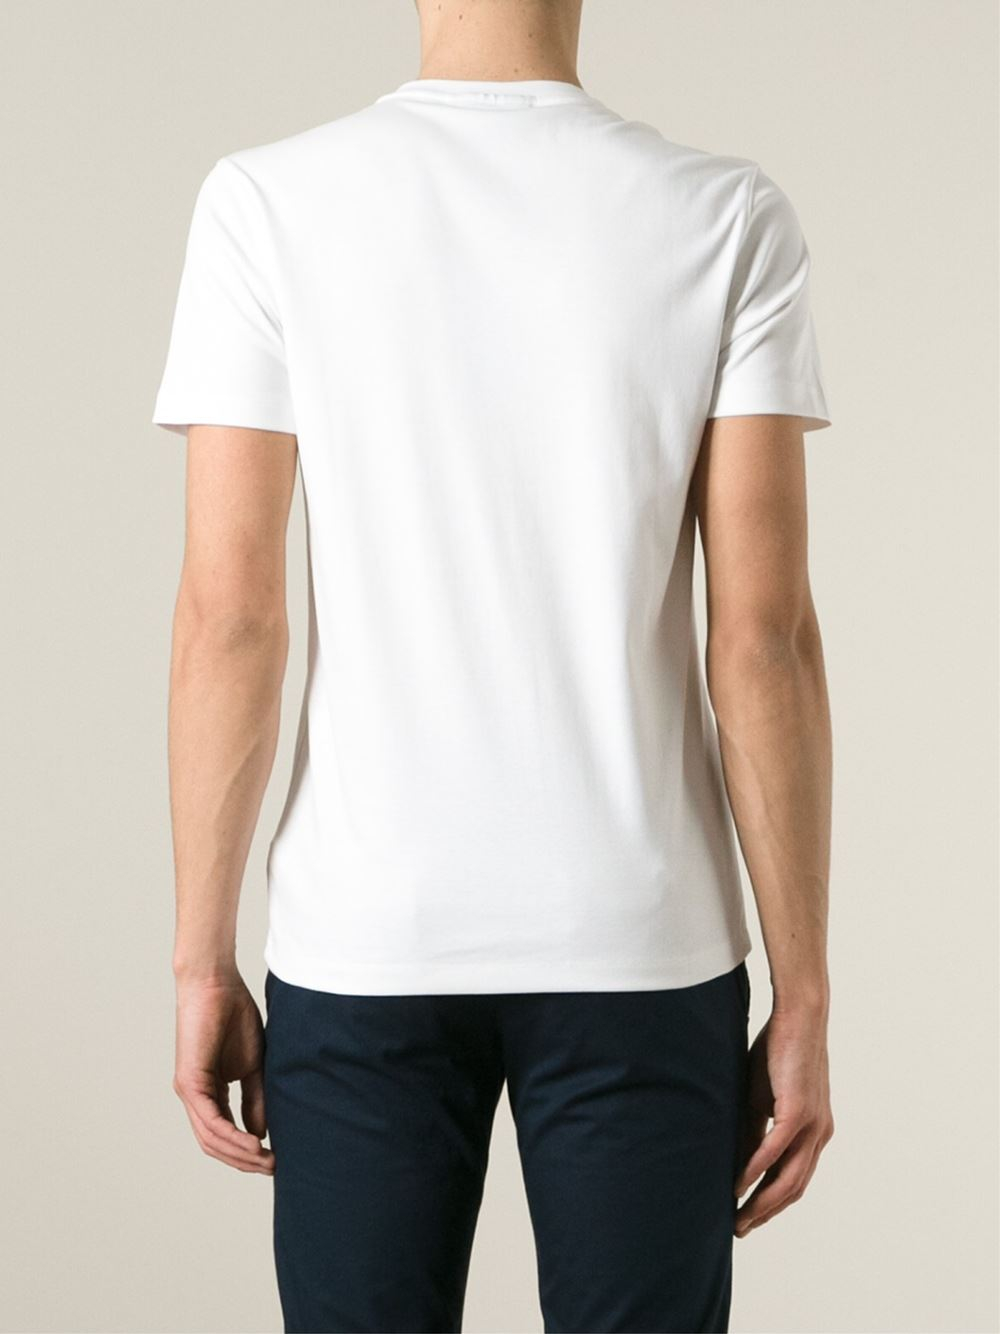 michael kors crew neck t shirt in white for men lyst. Black Bedroom Furniture Sets. Home Design Ideas